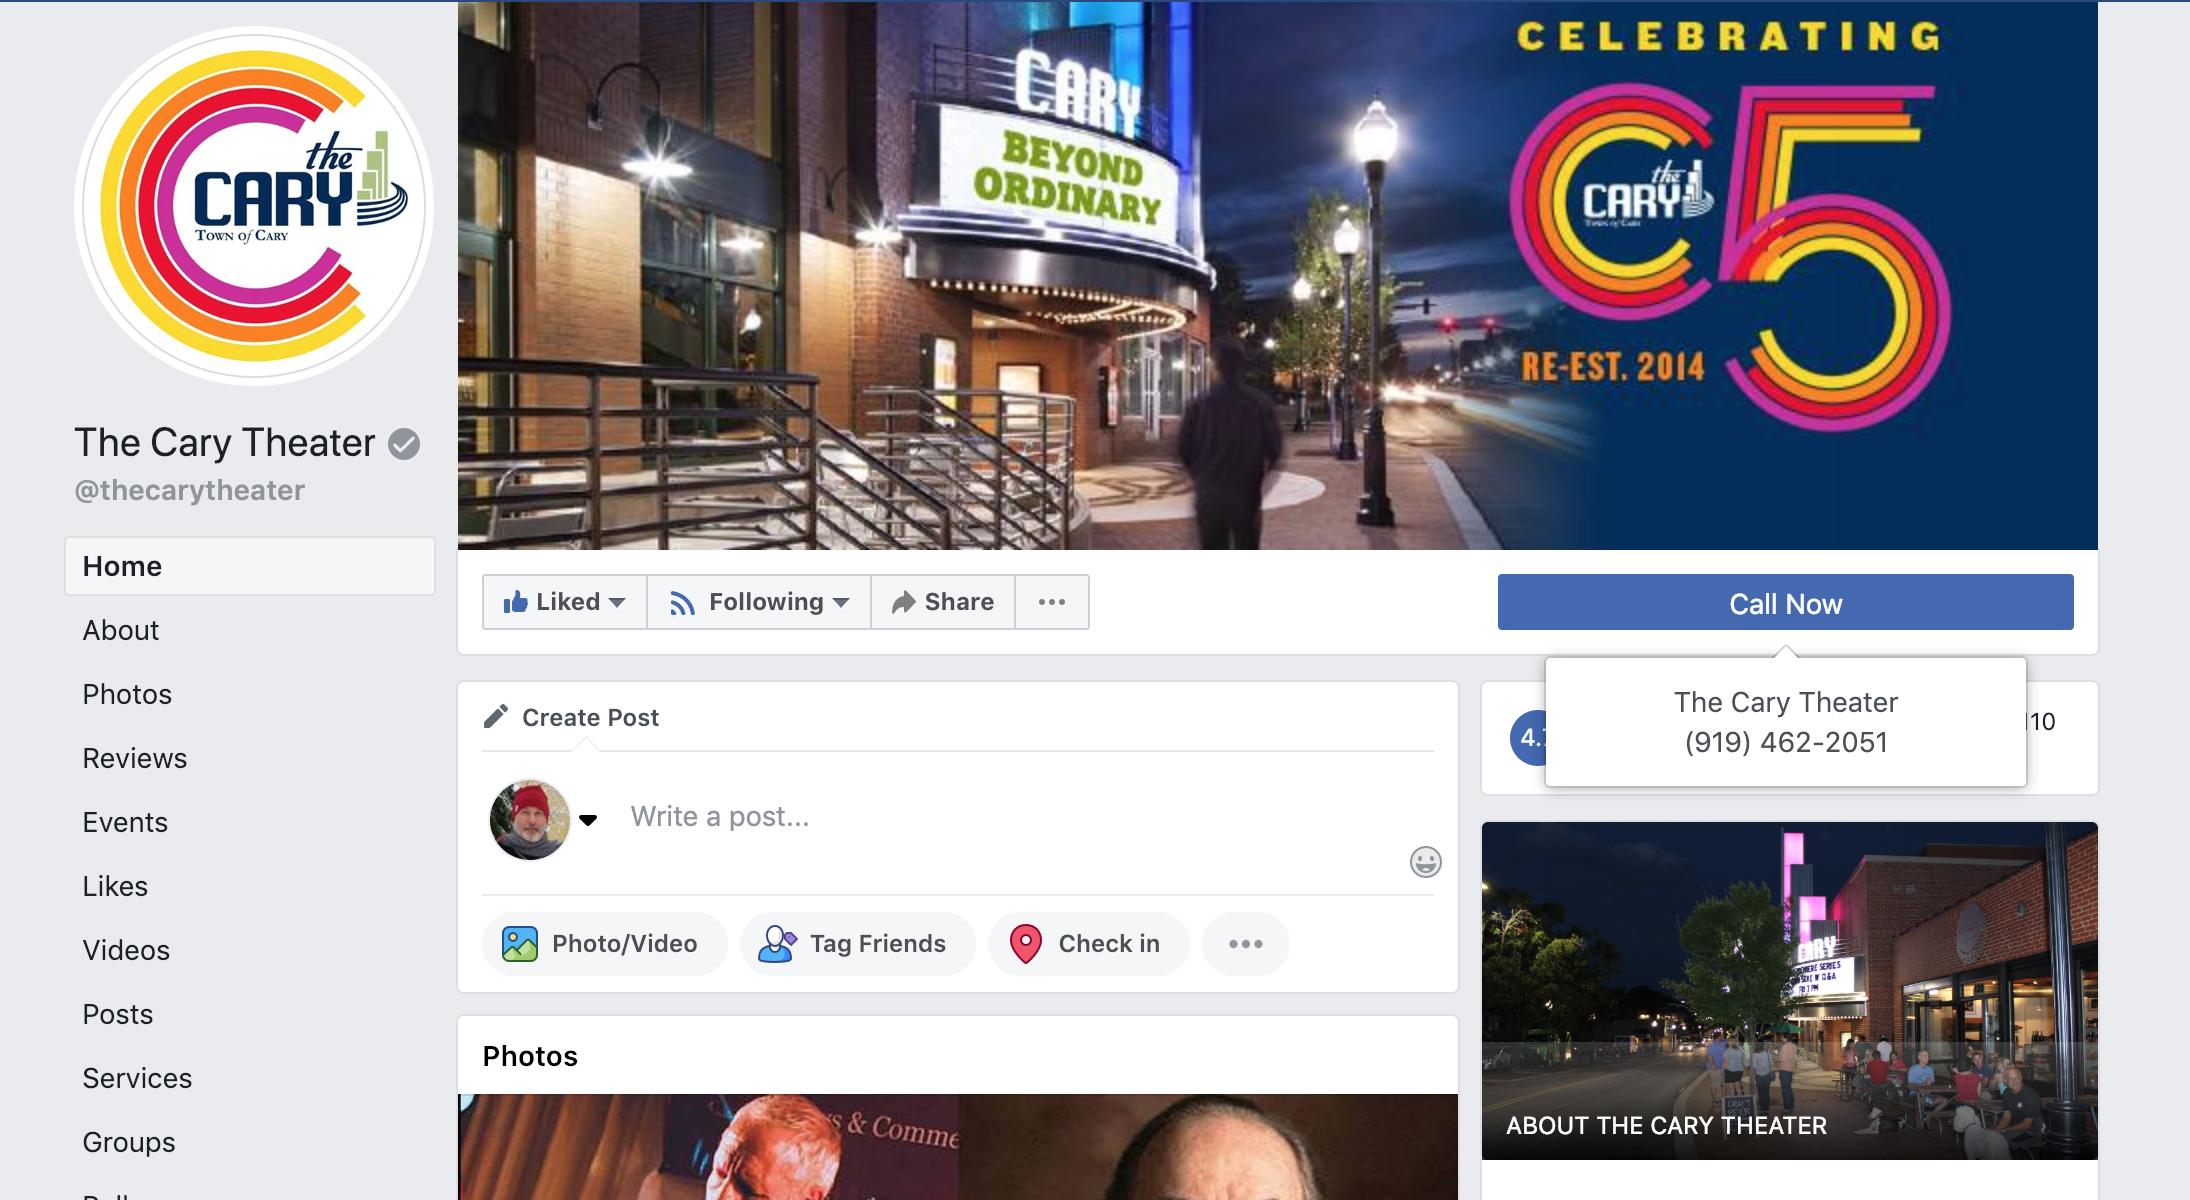 Screen_C5 Facebook_Cary Theater_012919.jpg